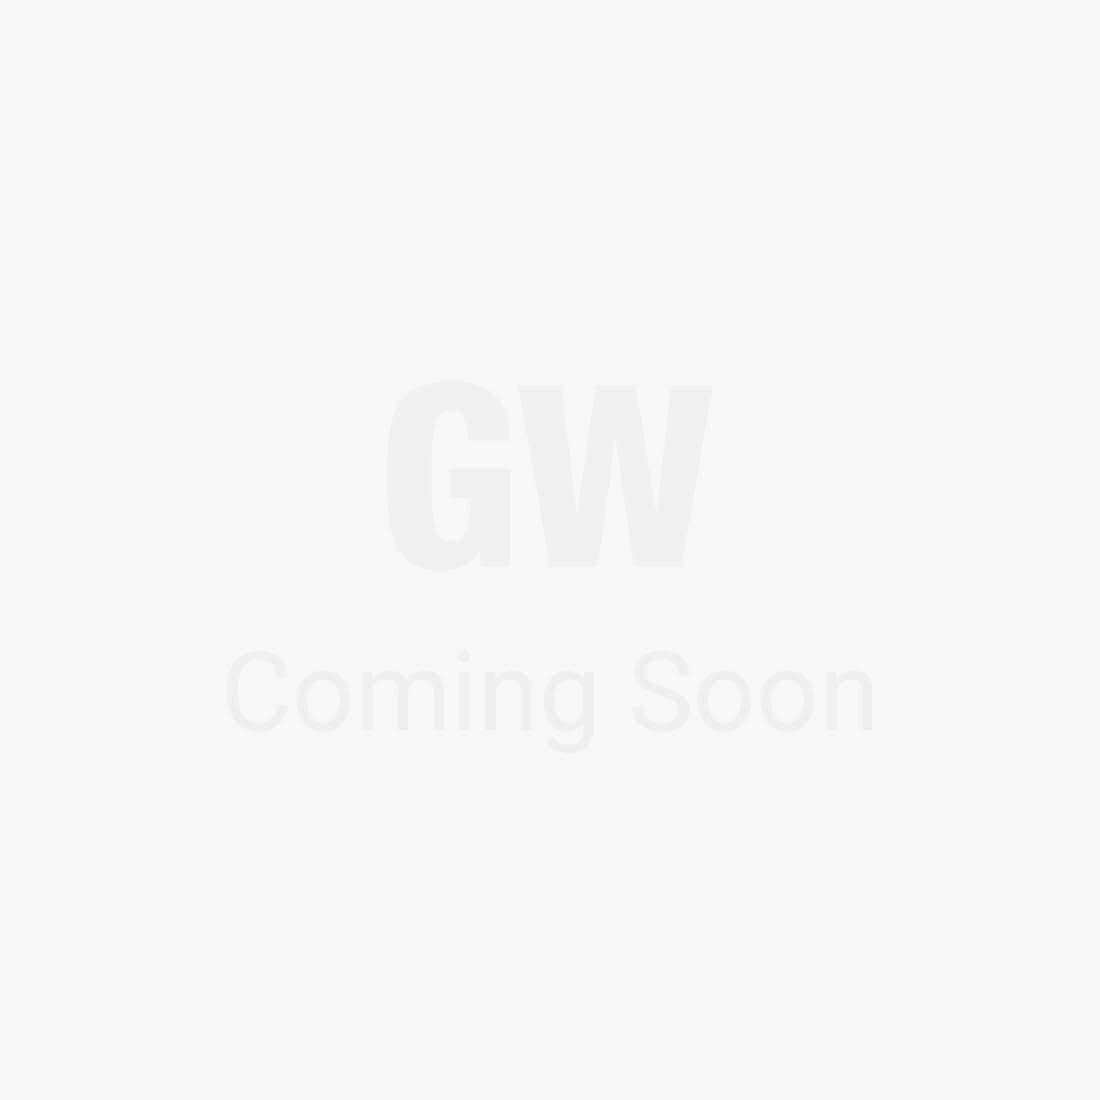 Cali Cross Dining Table